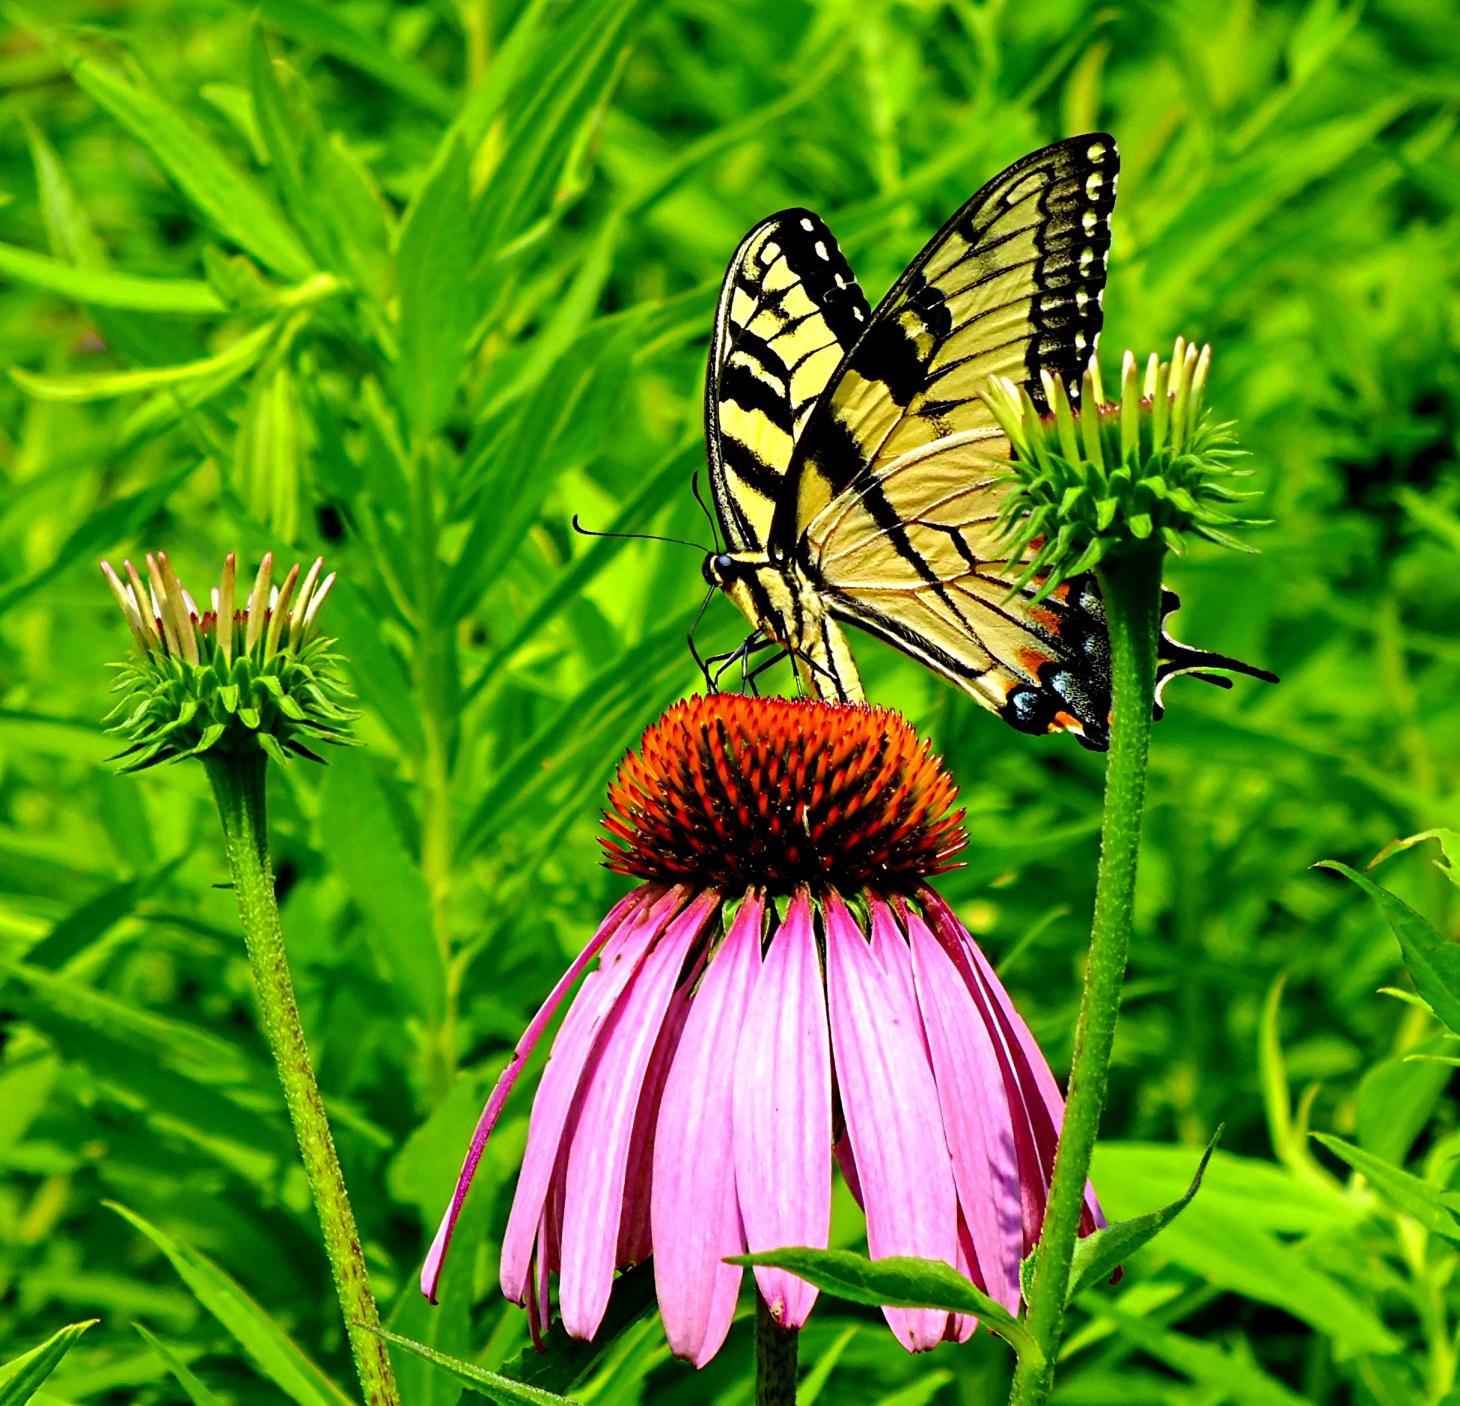 Yellow Swallowtail (photo 2) Photo by Thomas Peace 2014